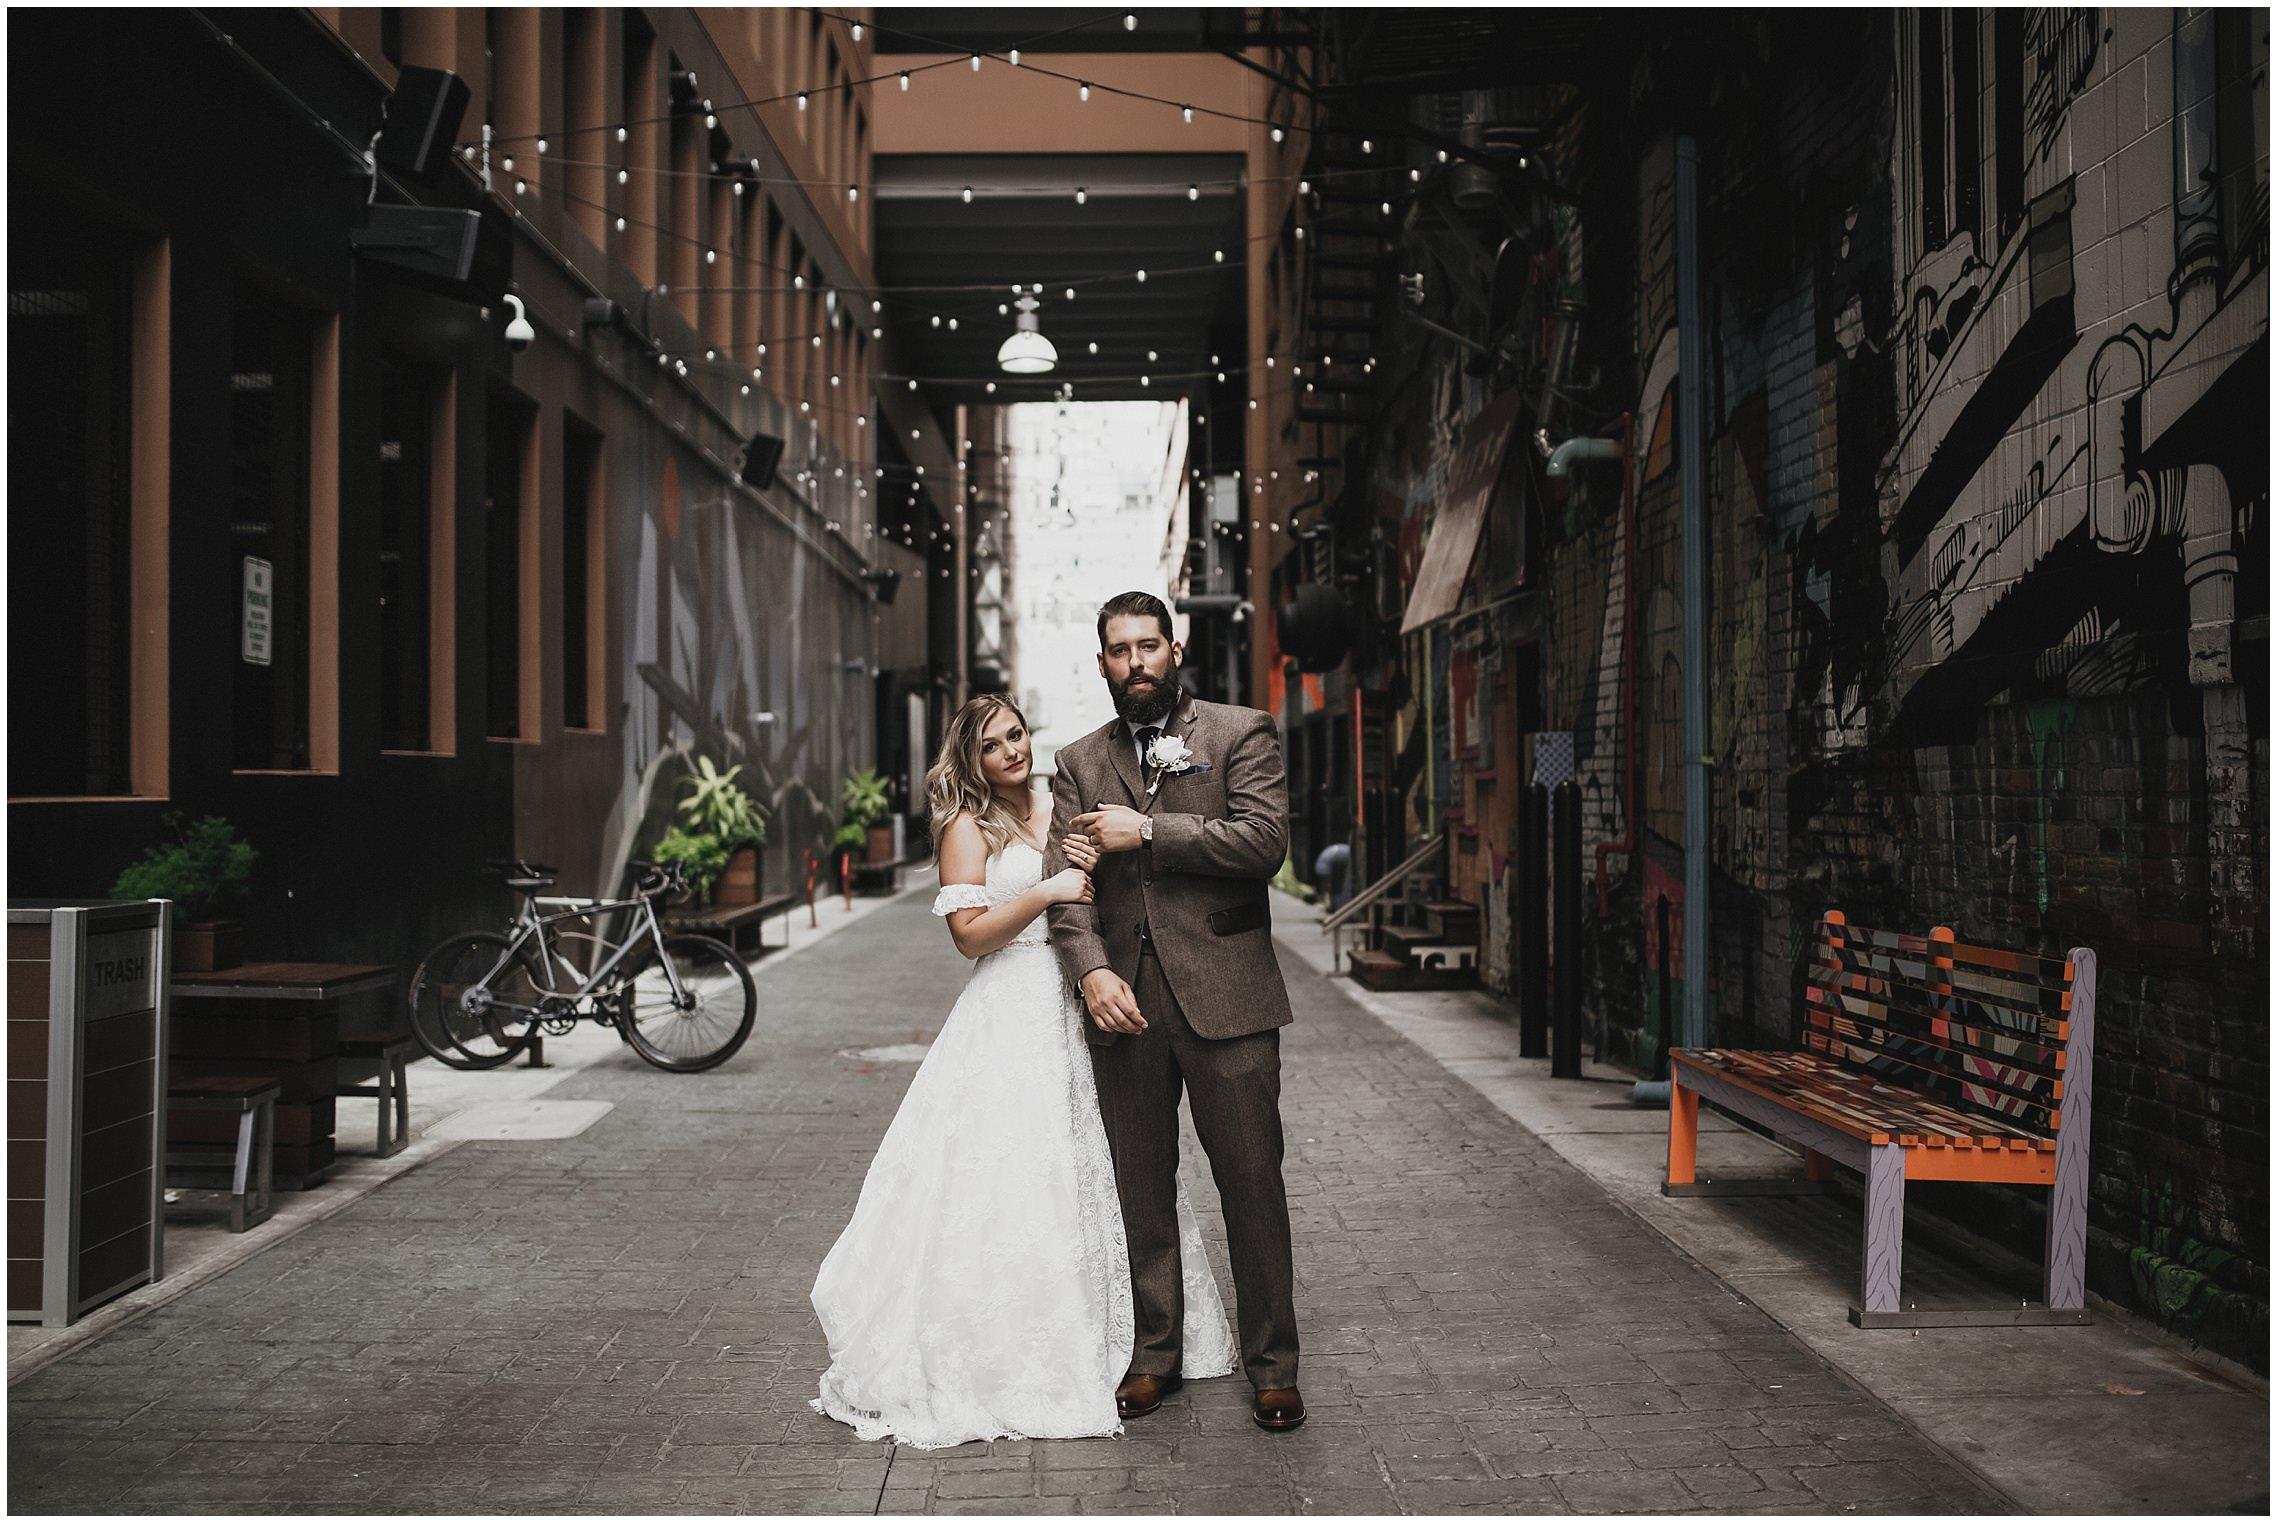 brick_and_mortar_colorado_wedding_photographer_0217.jpg